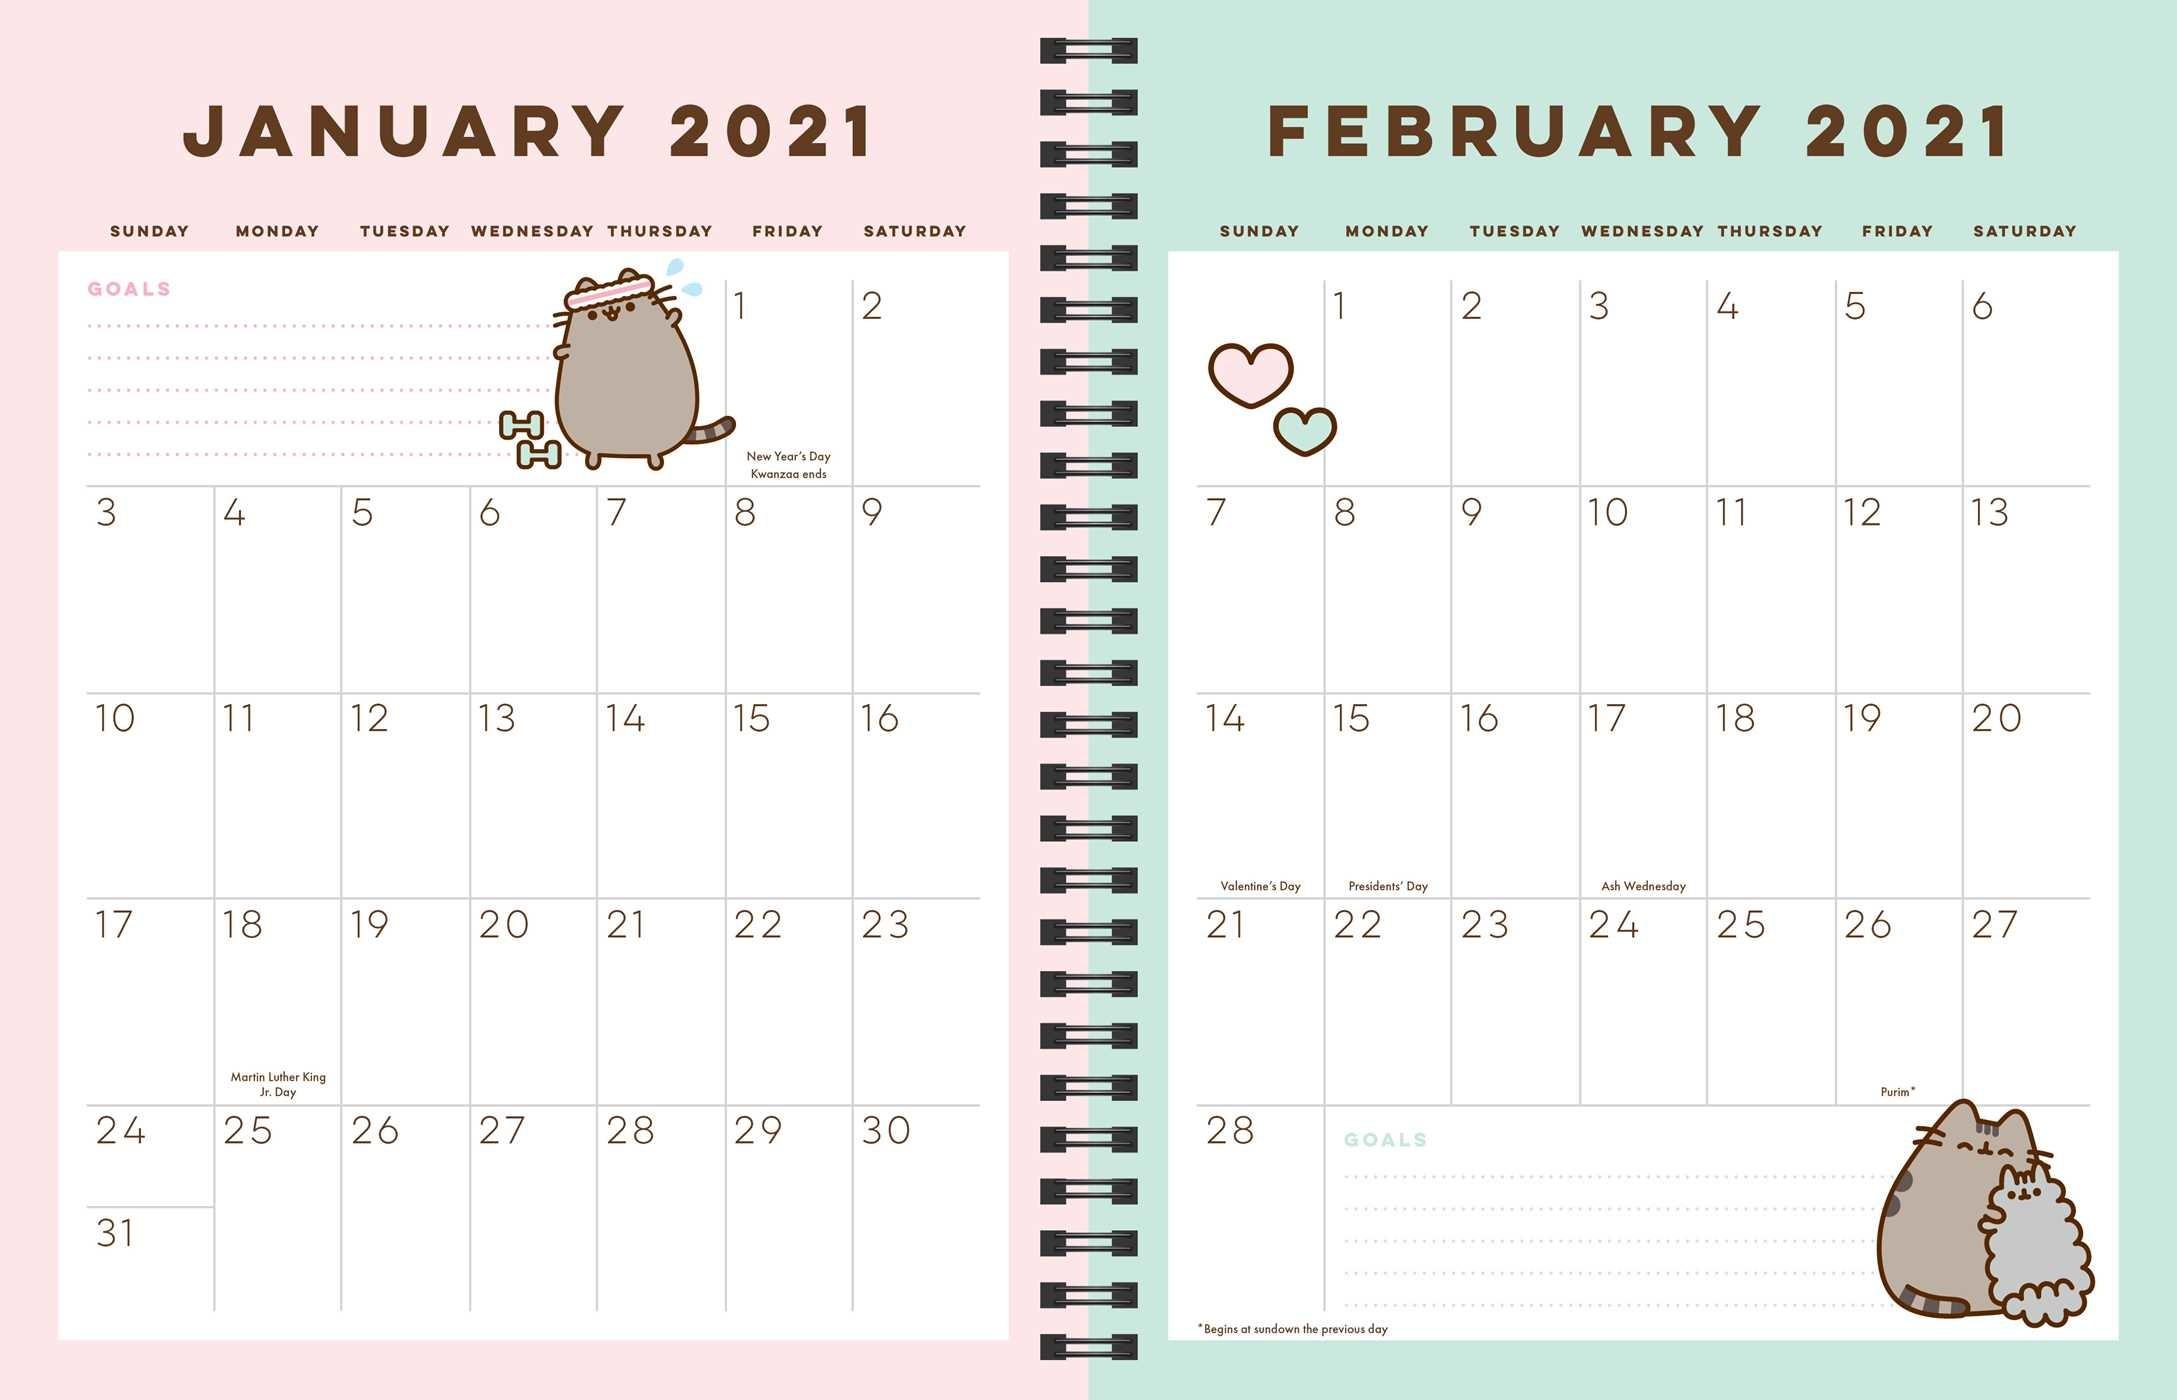 Pusheen 16-Month 2020-2021 Weekly/Monthly Planner Calendar inside 2021 Planner: Weekly Calendar Planner